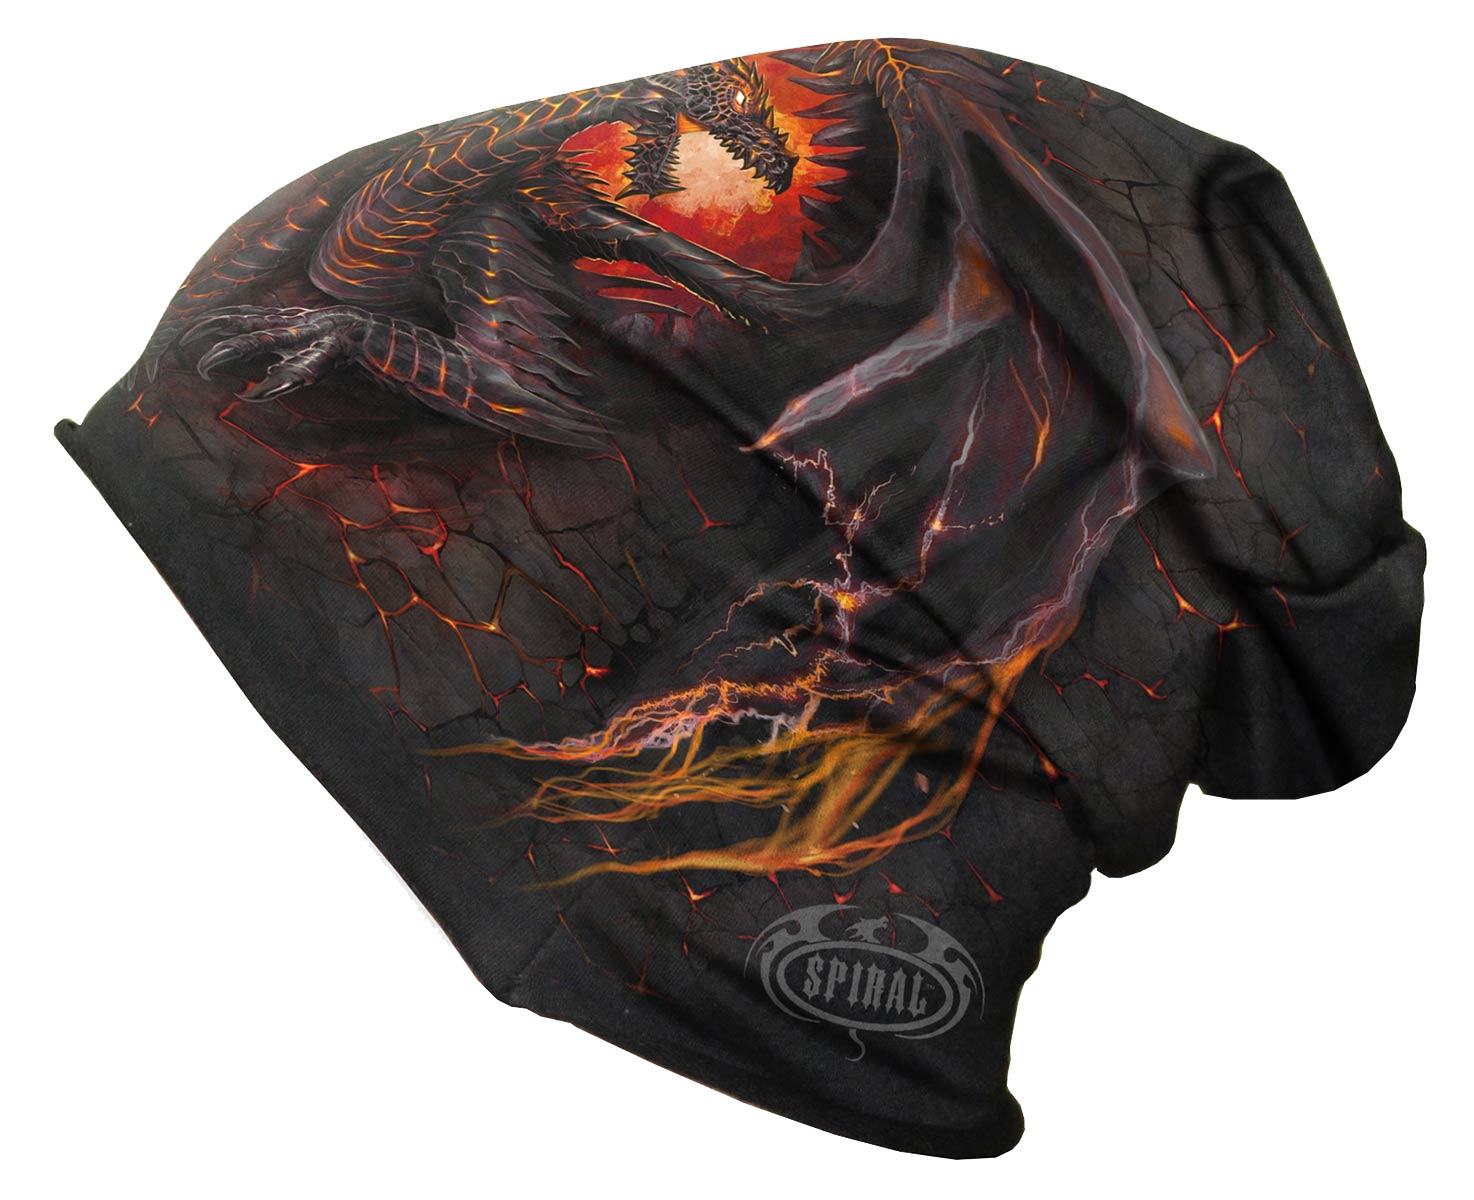 SPIRAL Dragon Furnace Baumwollbeanie schwarz L016A801